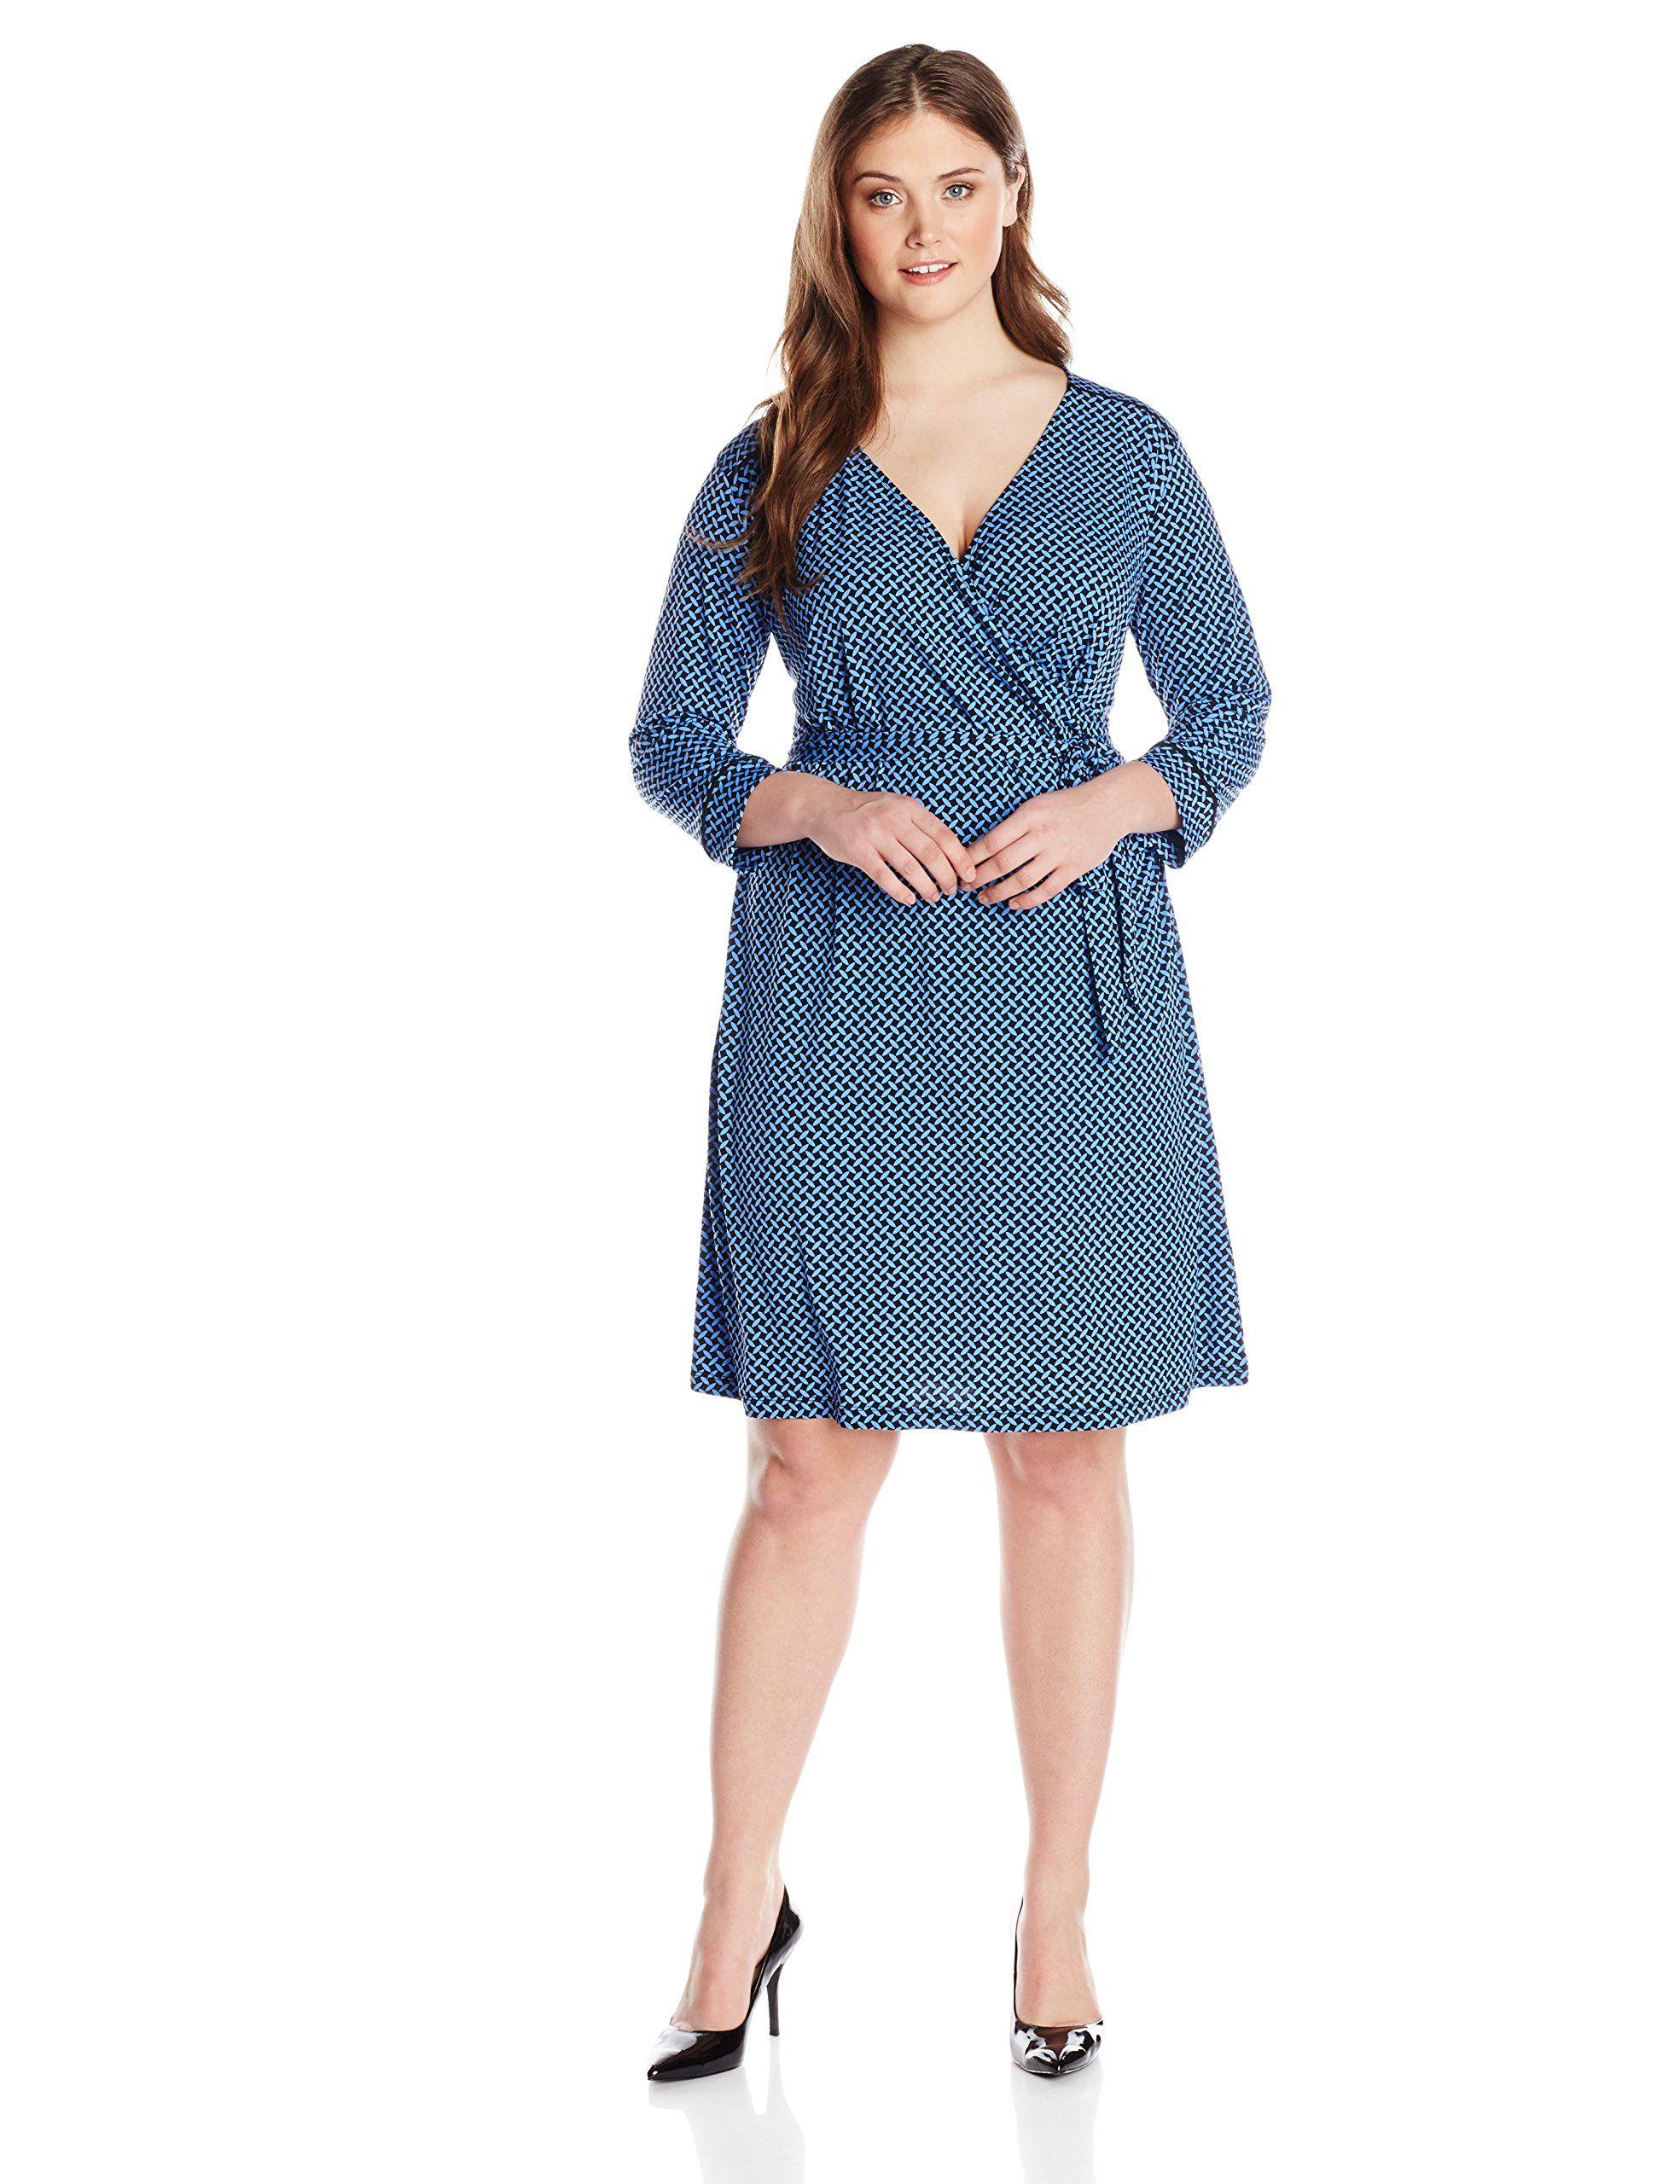 Jones New York Women S Plus Size 3 4 Sleeve Wrap Dress With Tie Belt At Amazon Women S Clothing Store Wrap Dress Clothes Dresses [ 2560 x 1969 Pixel ]